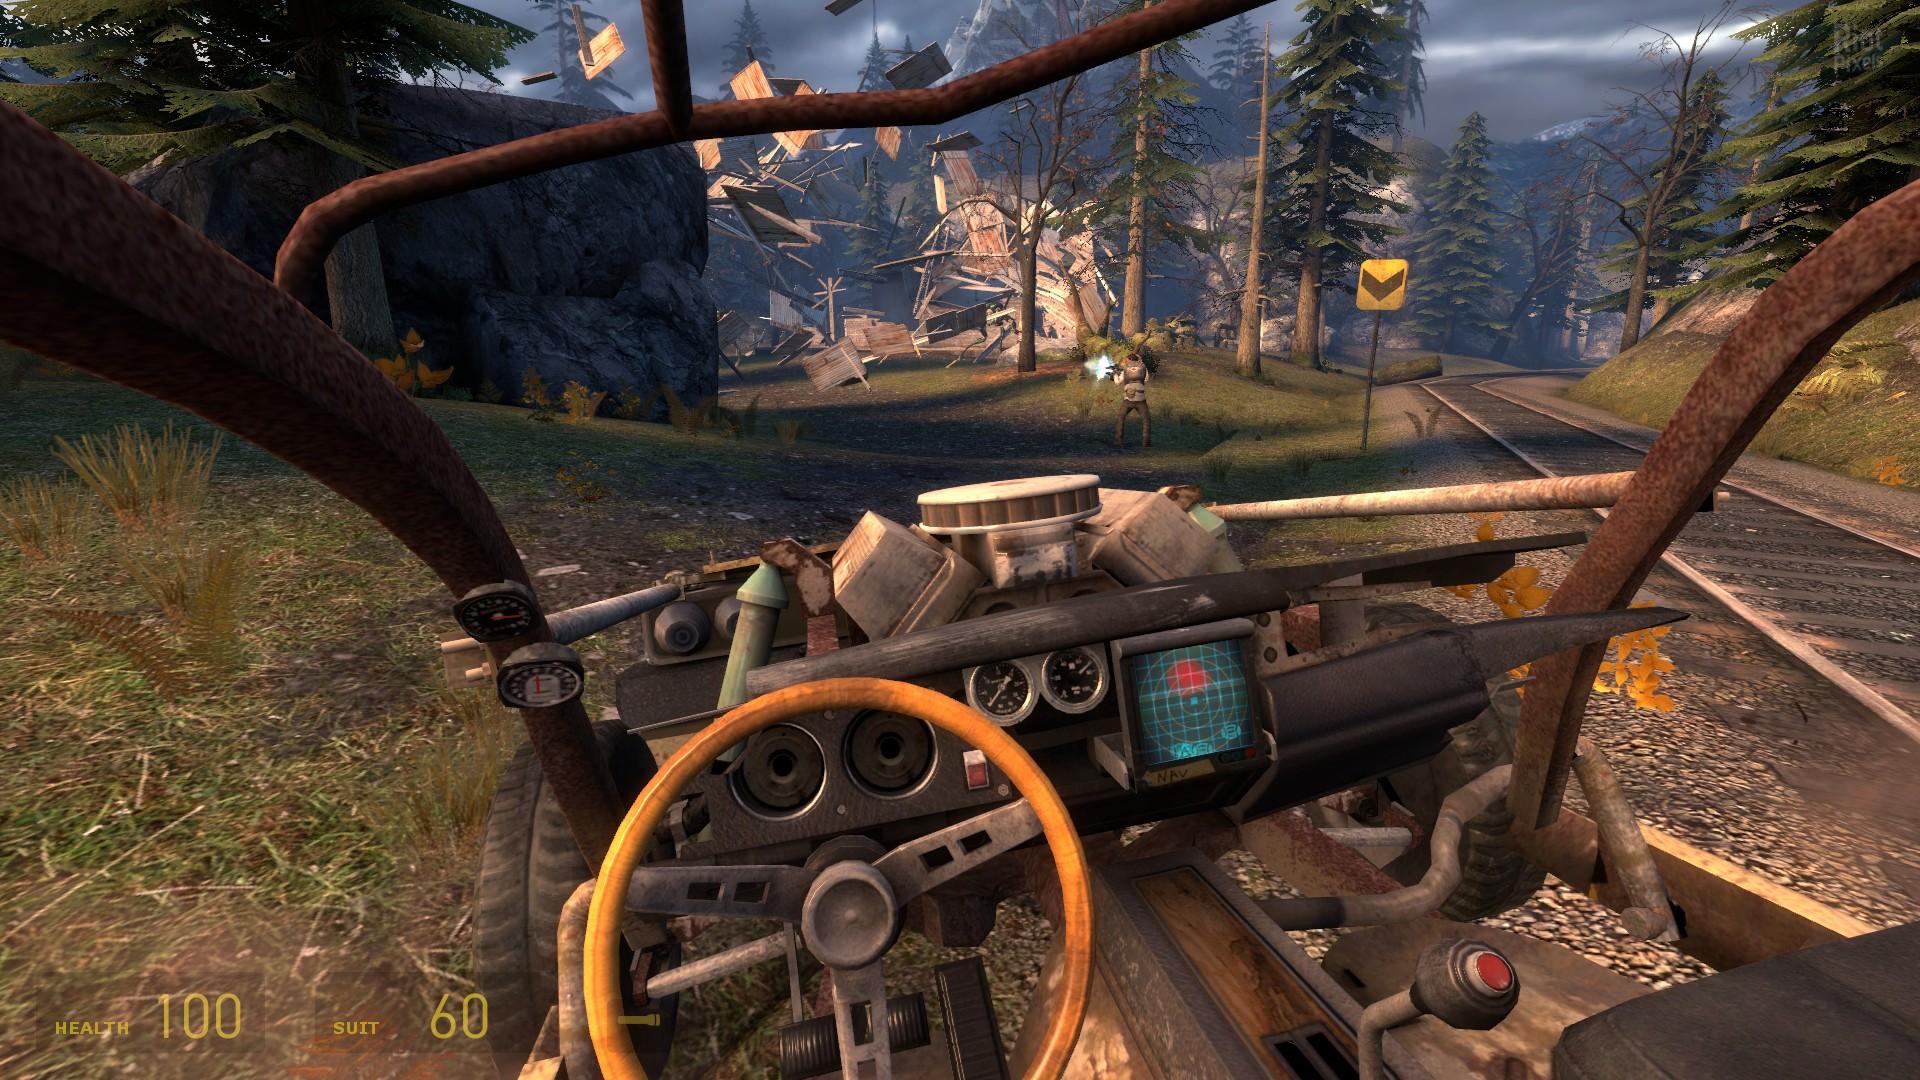 Half-life 2 - fakefactory cinematic mod v11 release candidate (fakefactory) (rus) mods rip от rgbestgamernet